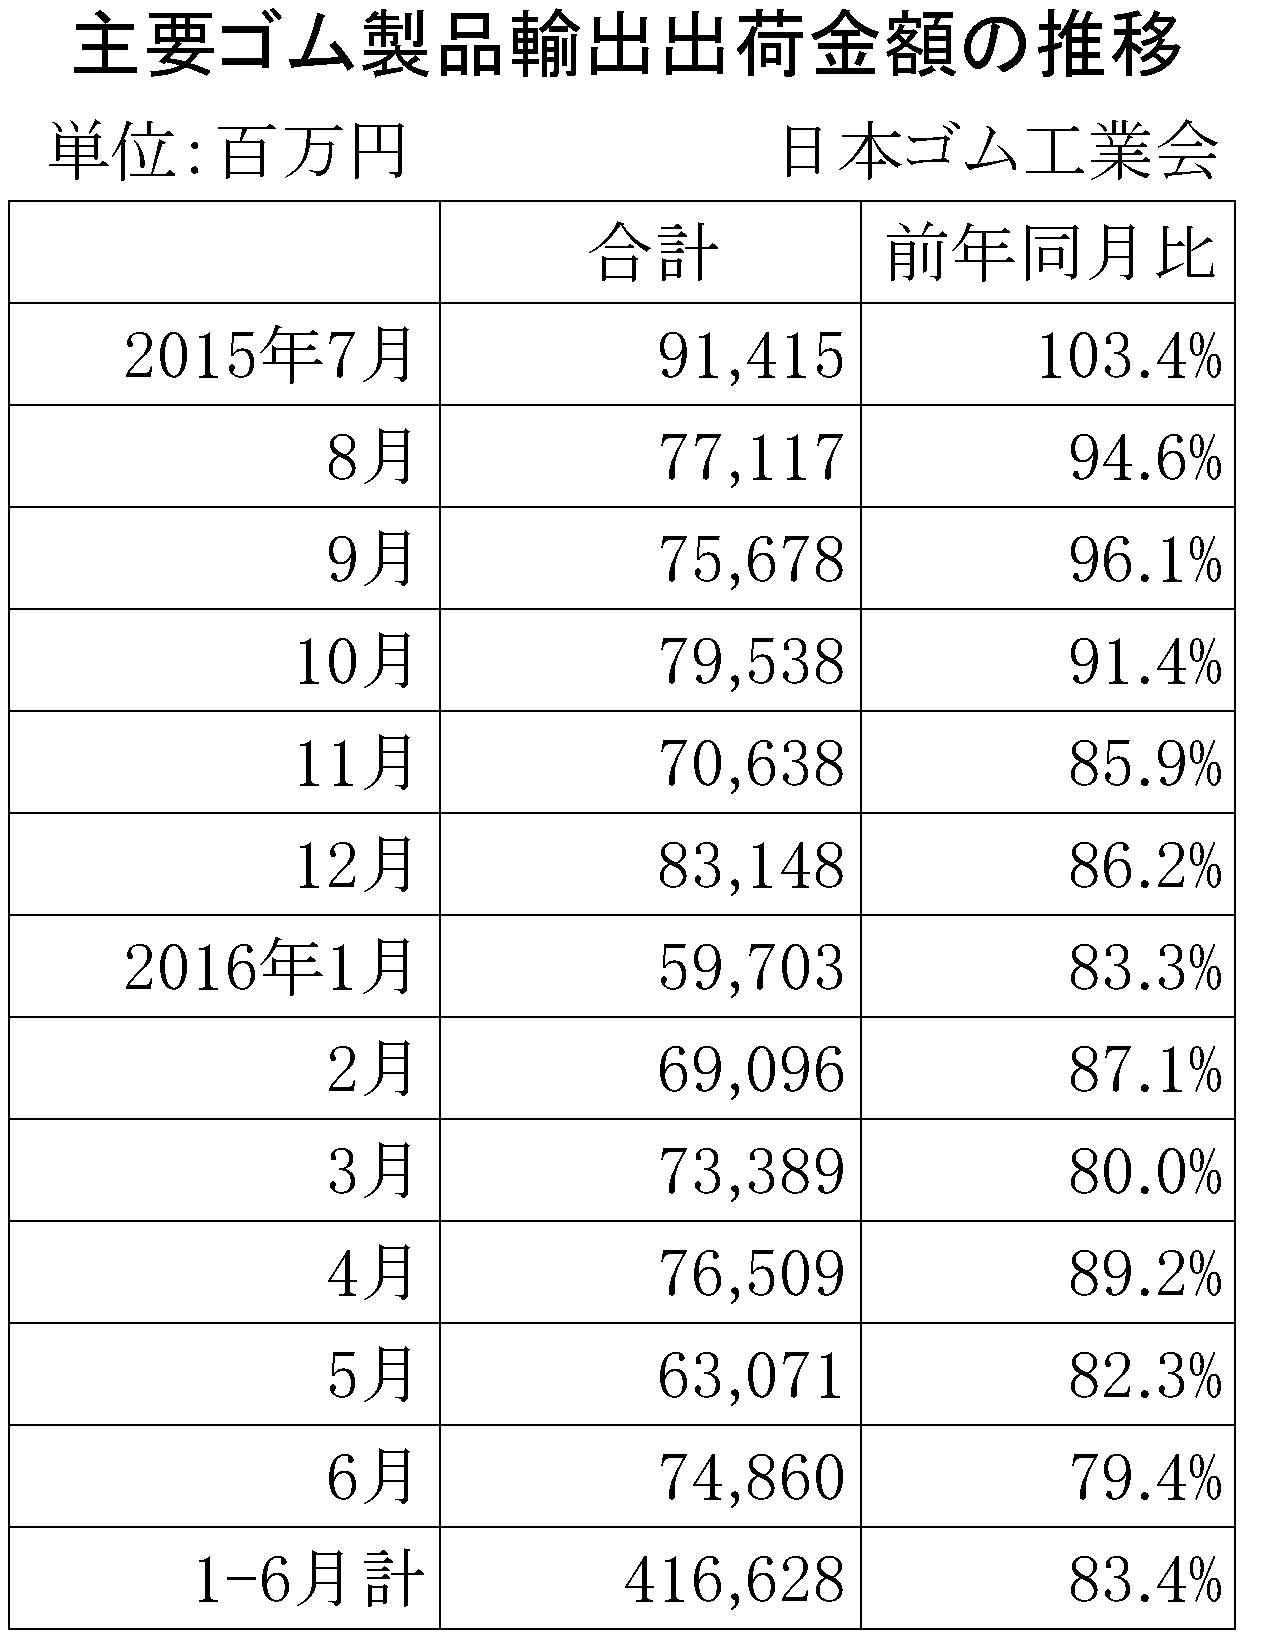 2016年6月ゴム製品輸出金額